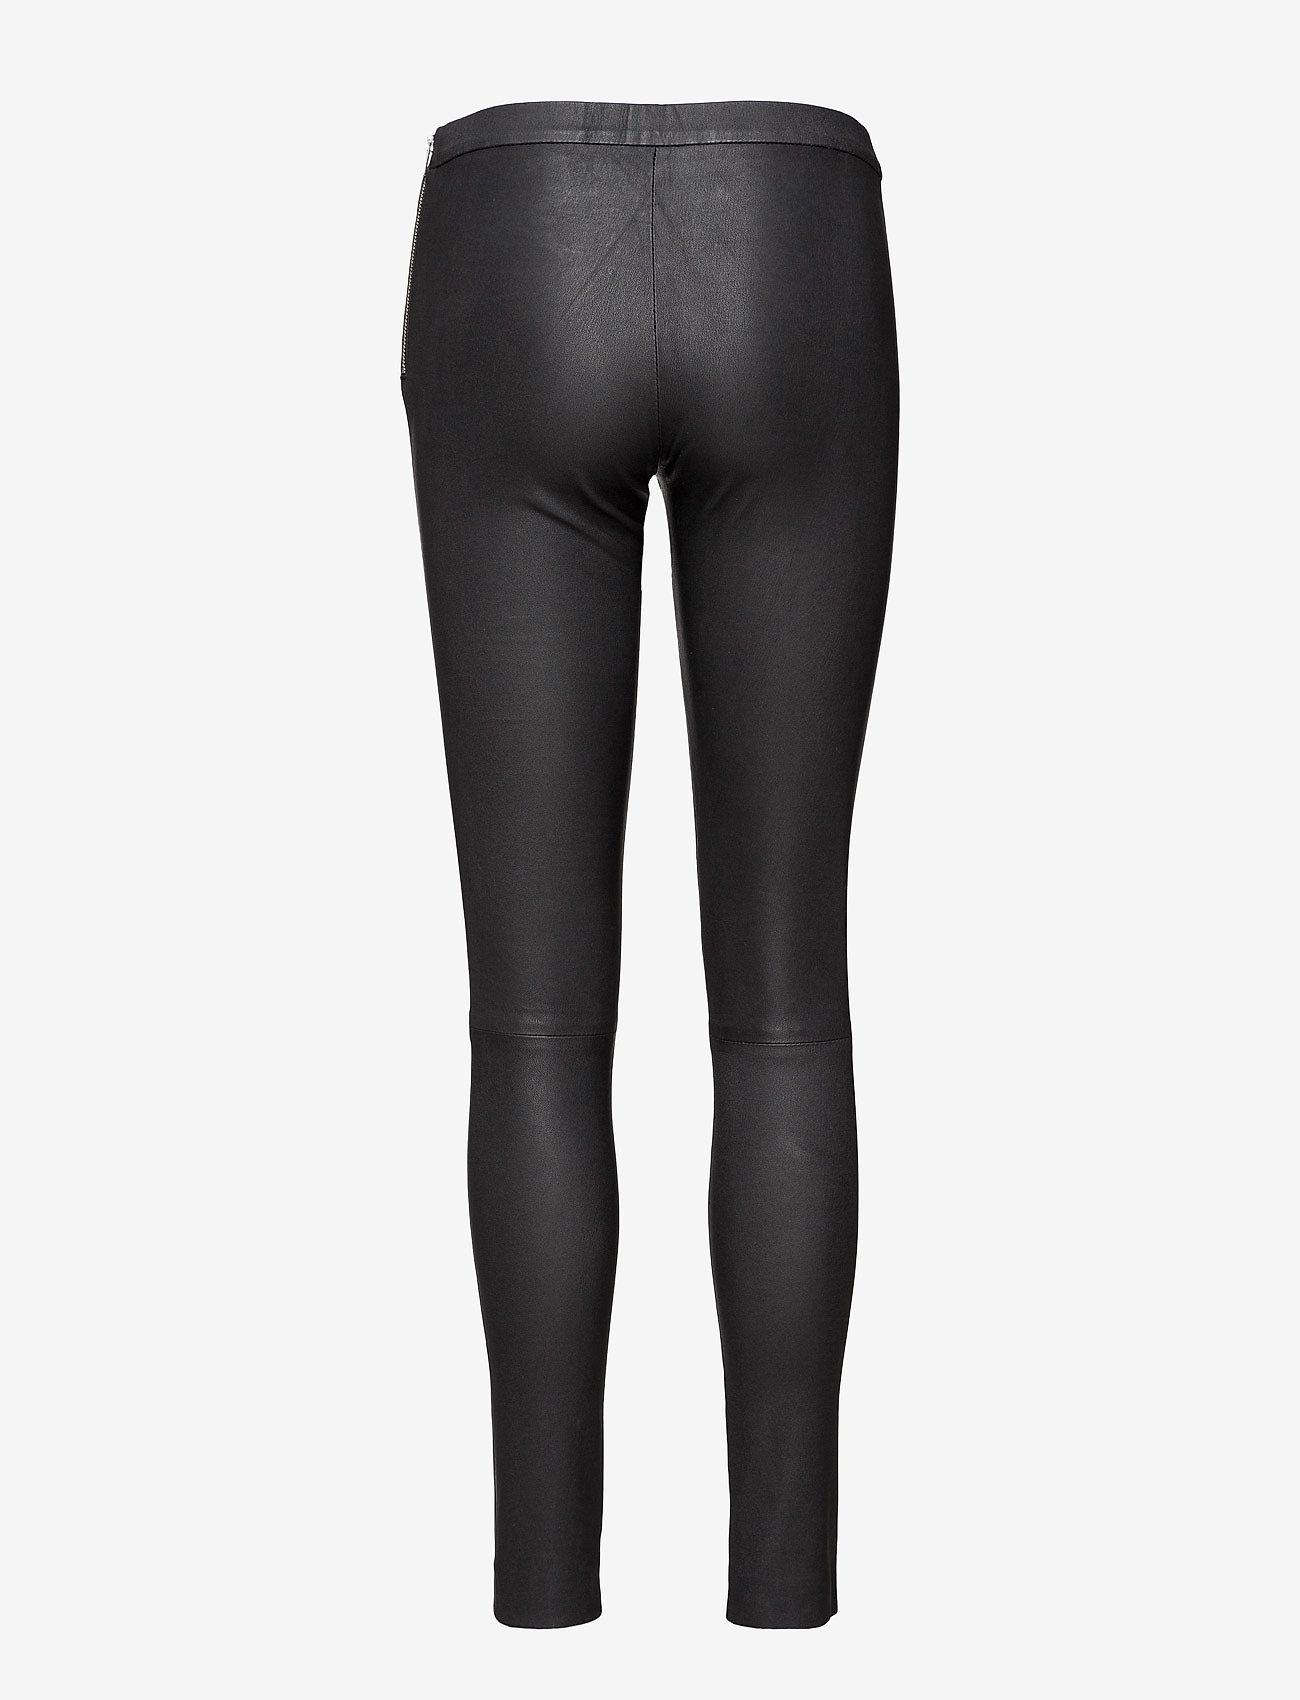 DEPECHE - Pants - læderbukser - black - 1